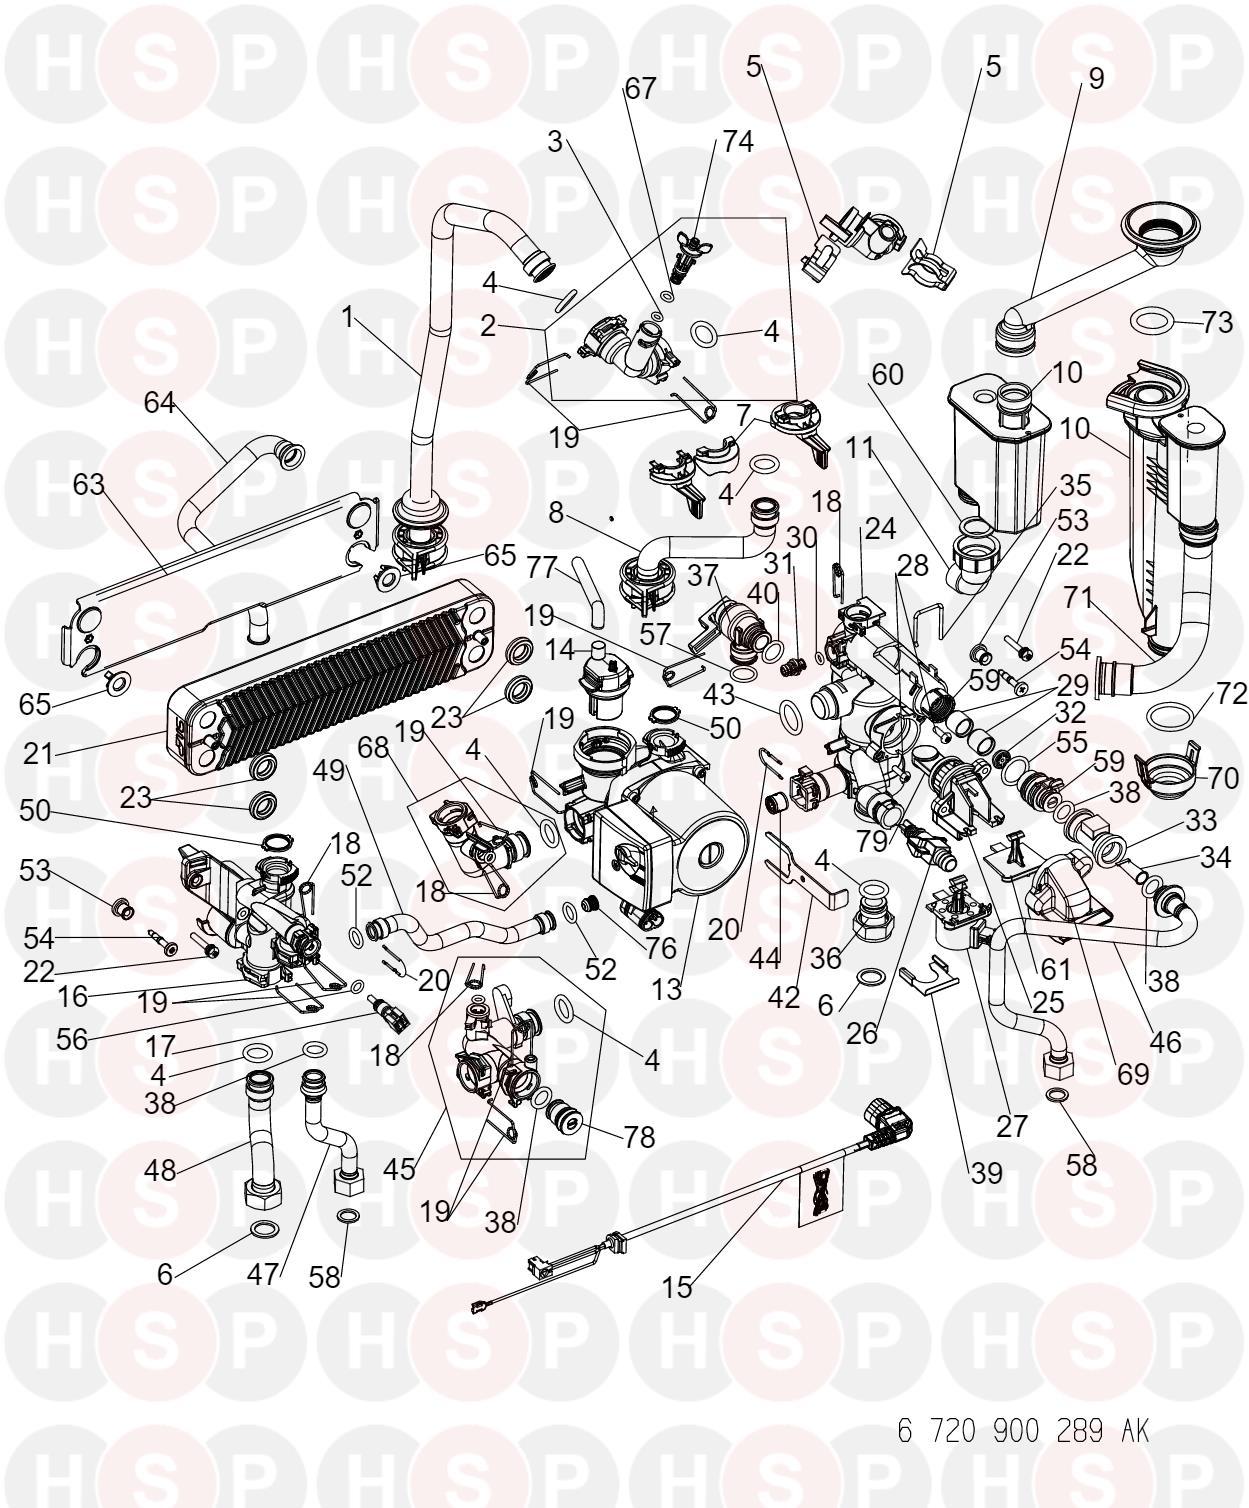 Worcester GREENSTAR 28 I JUNIOR HE (Hydraulics) Diagram